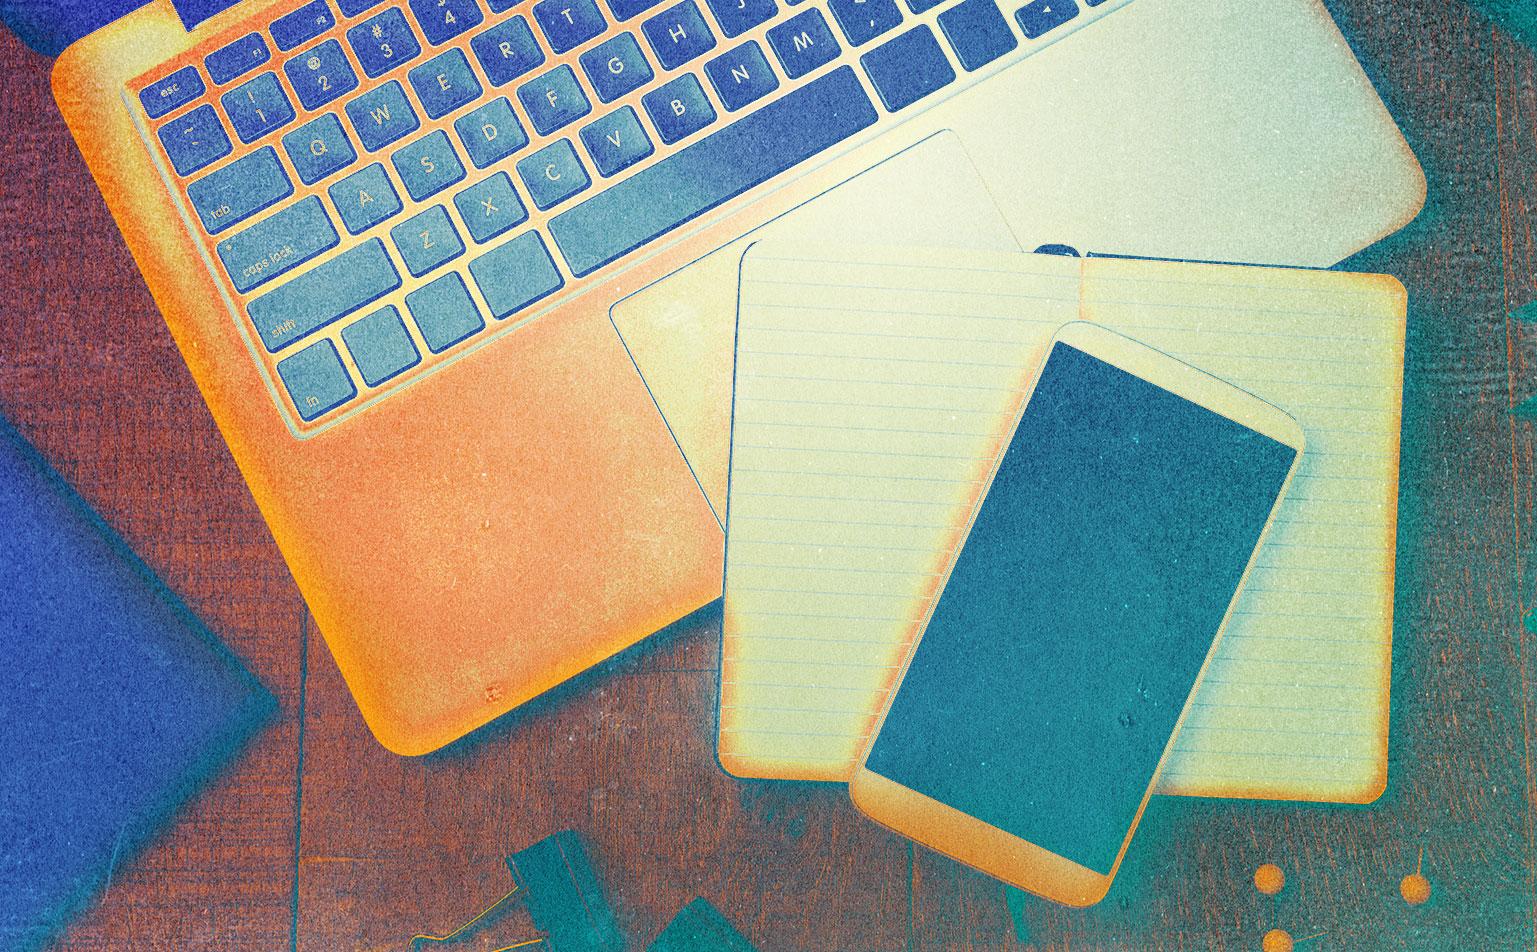 Taking Notes: Paper vs. Laptops vs. Apps